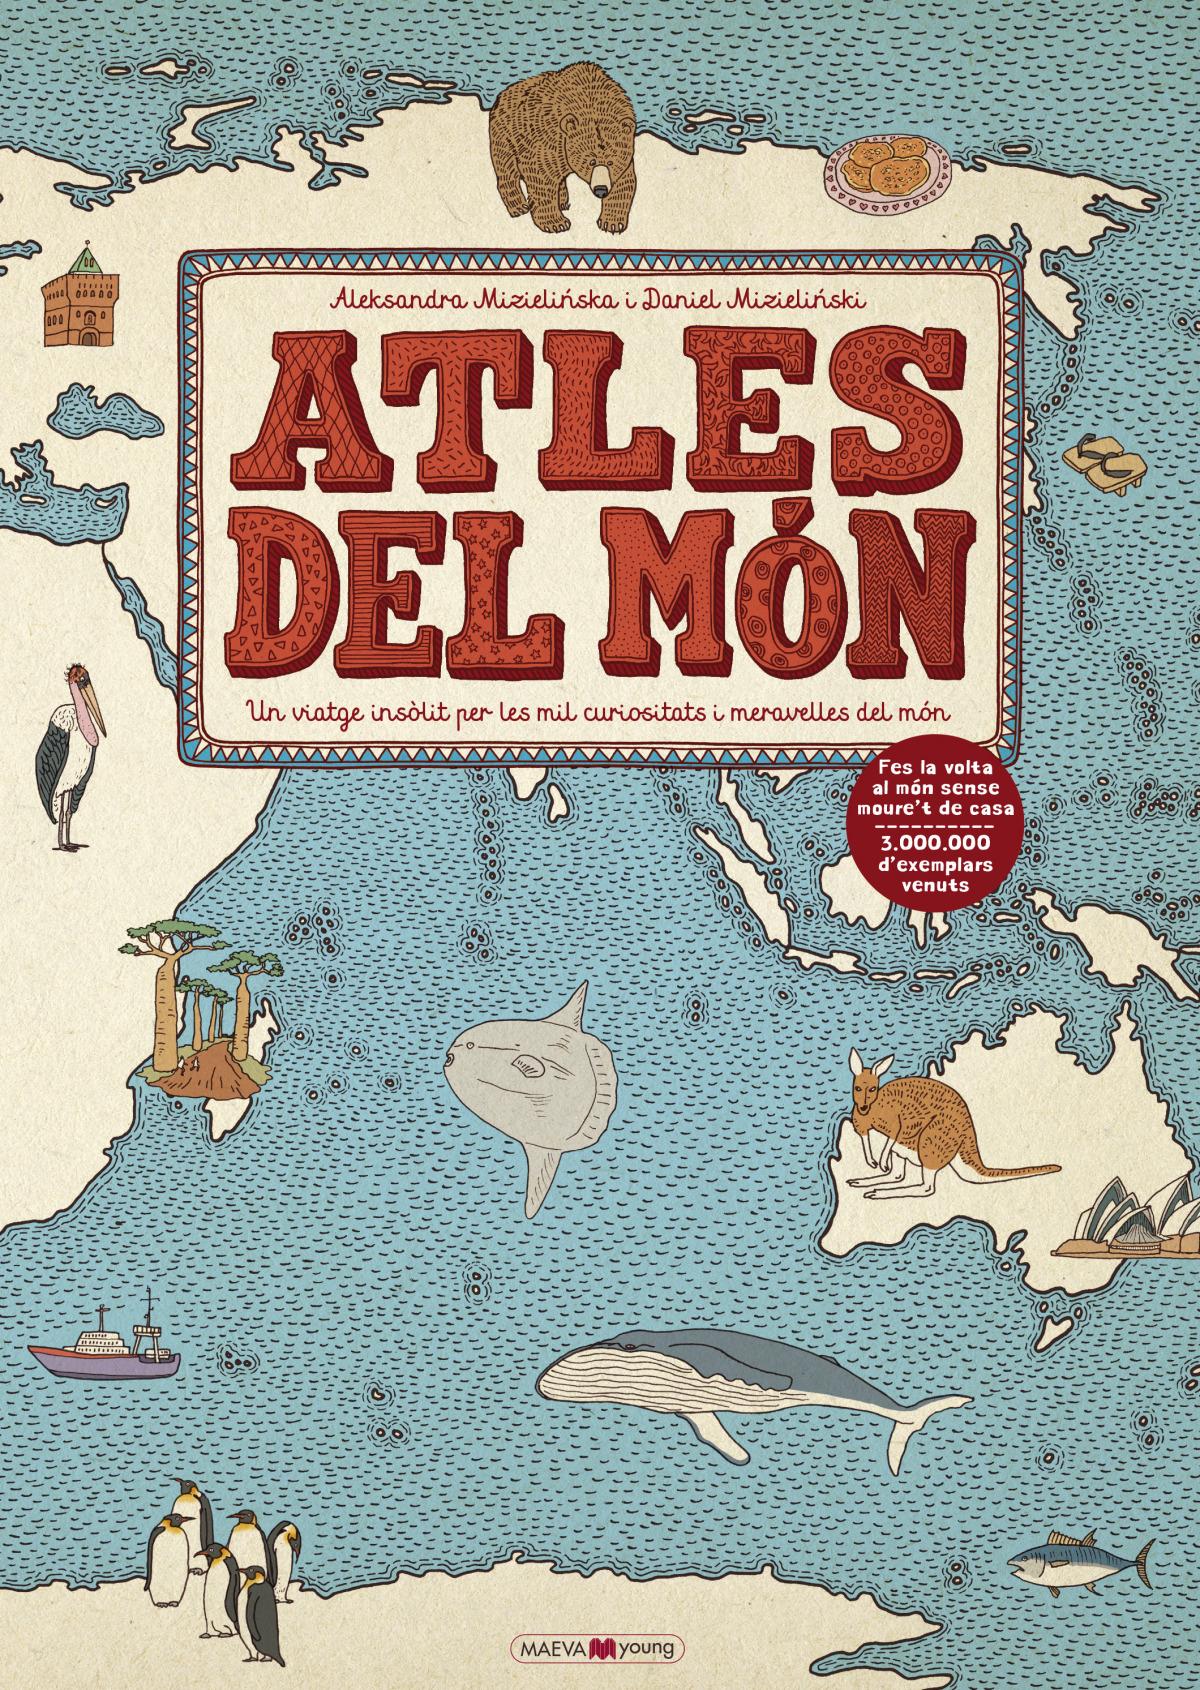 ATLES DEL MON 9788417108311